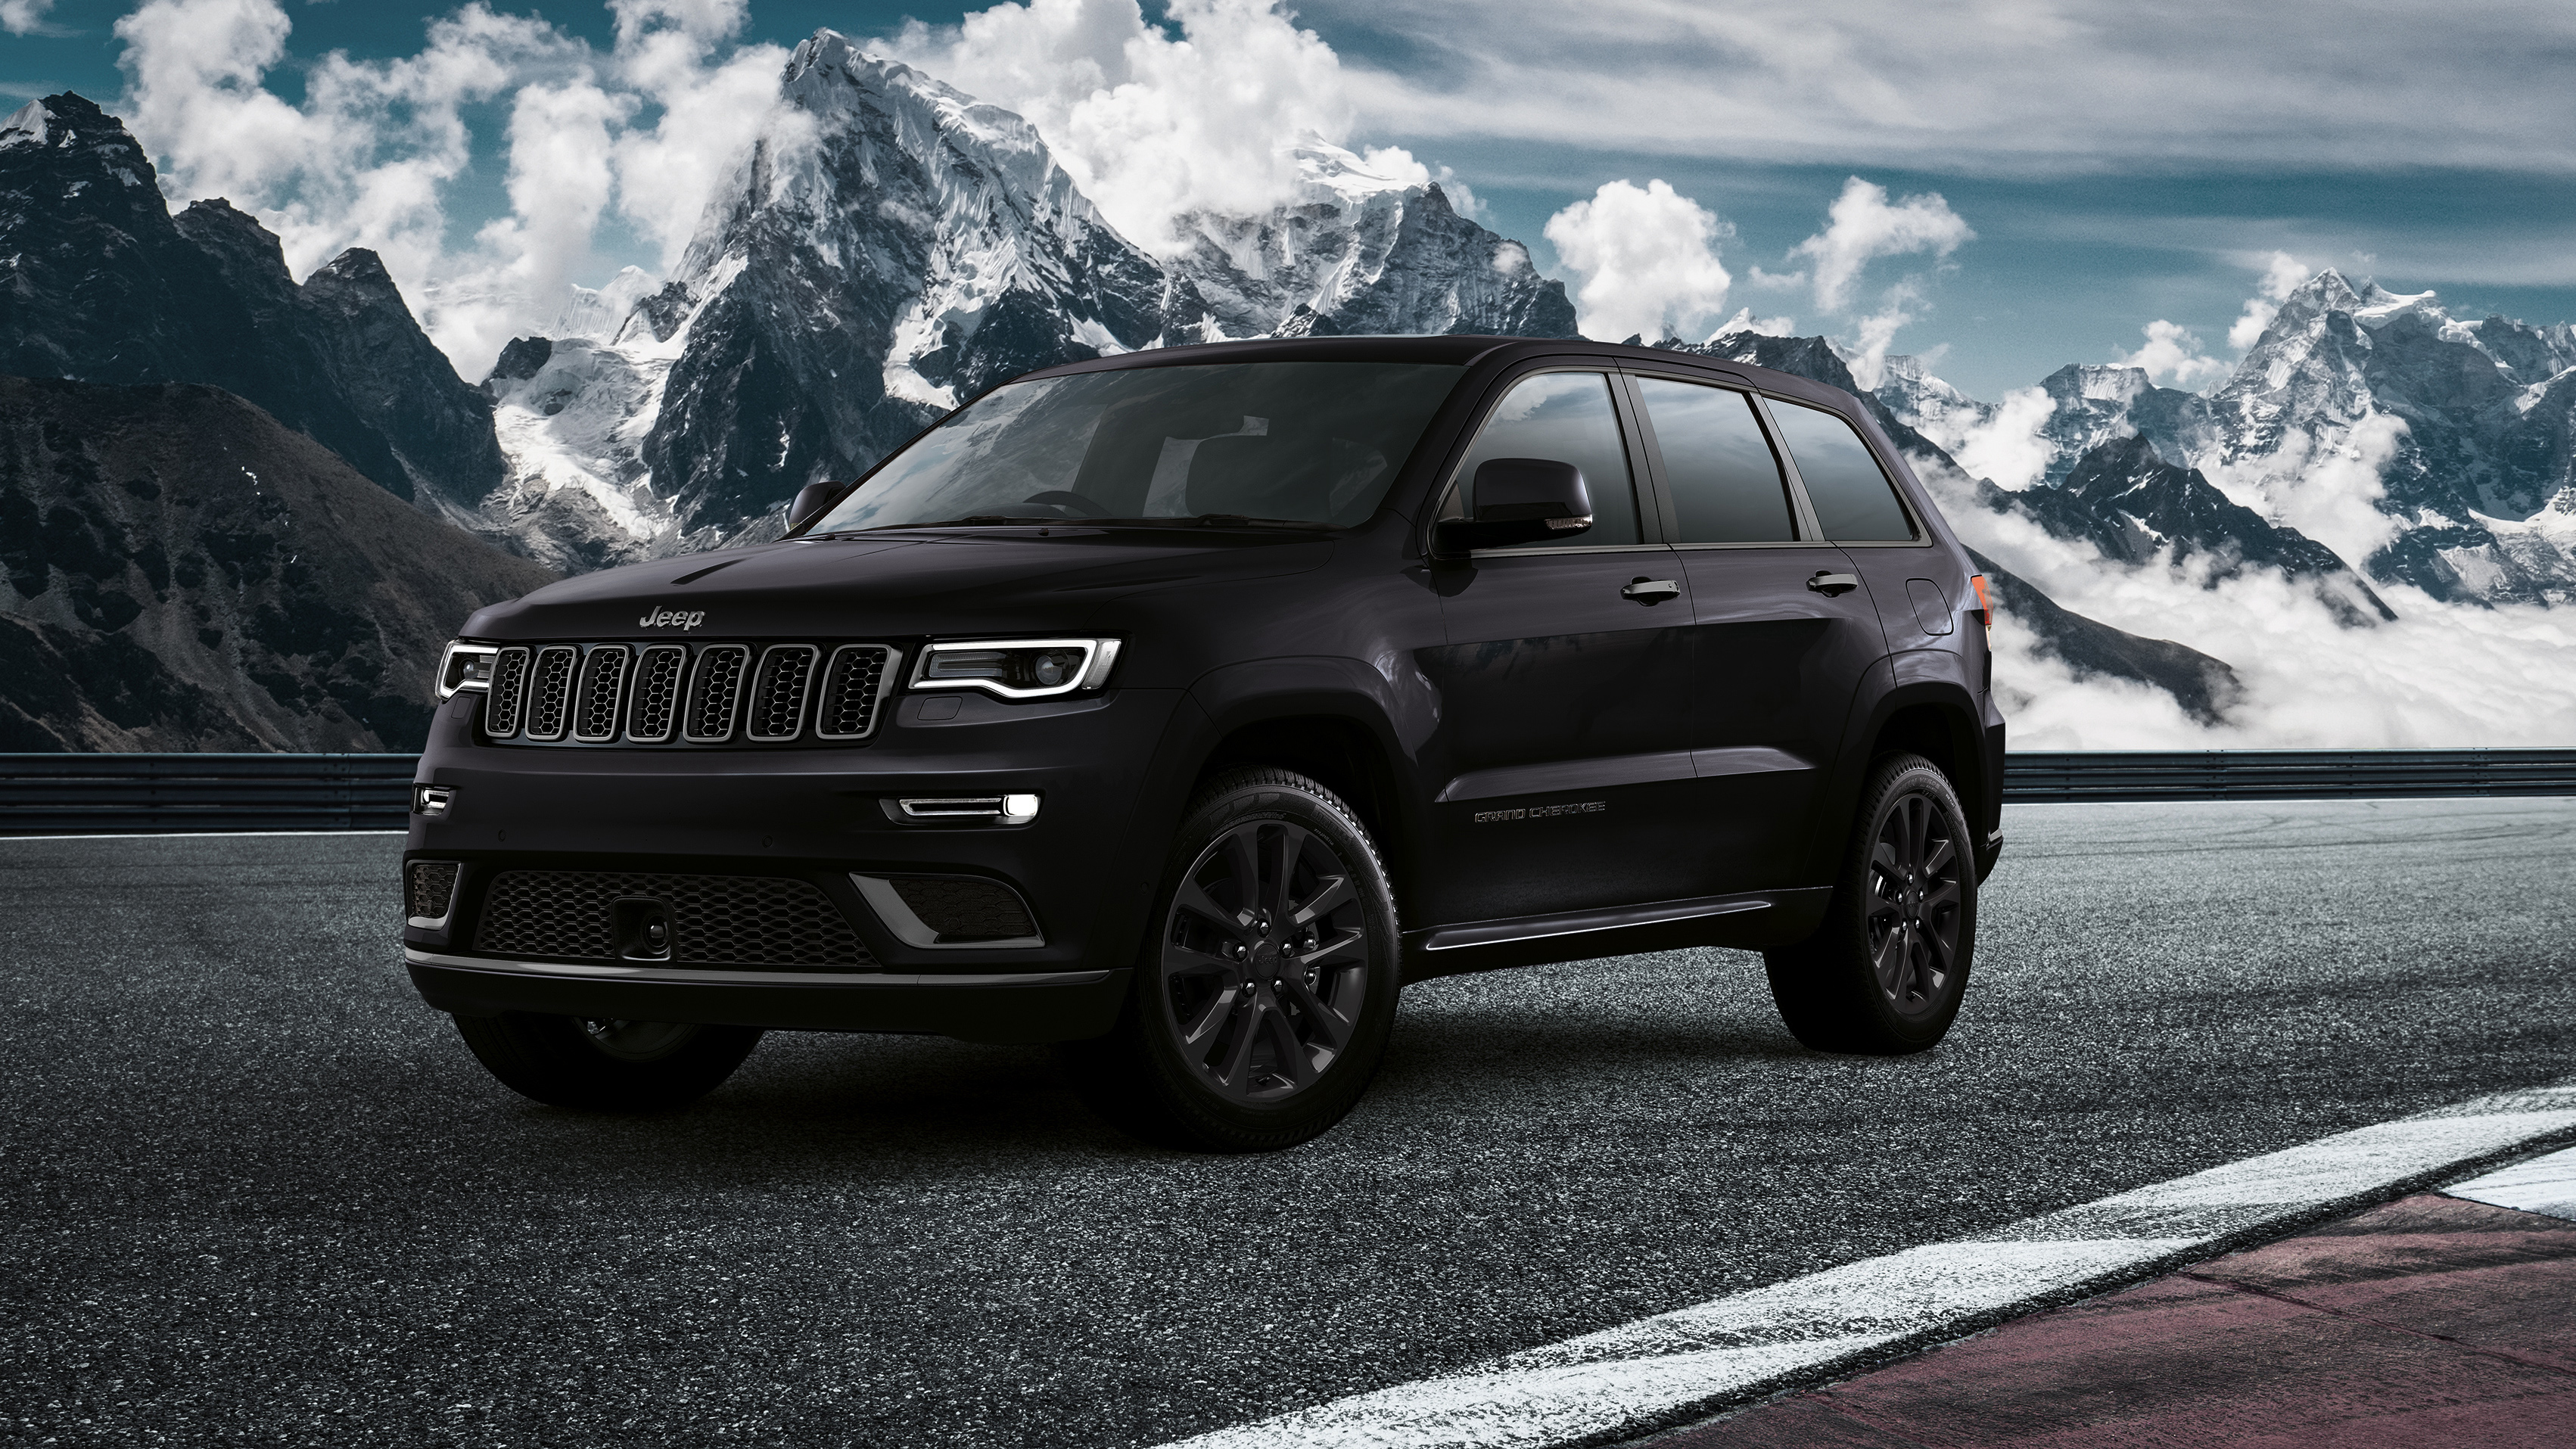 2019 Jeep Grand Cherokee S Wallpaper HD Car Wallpapers ID 9474 3404x1915